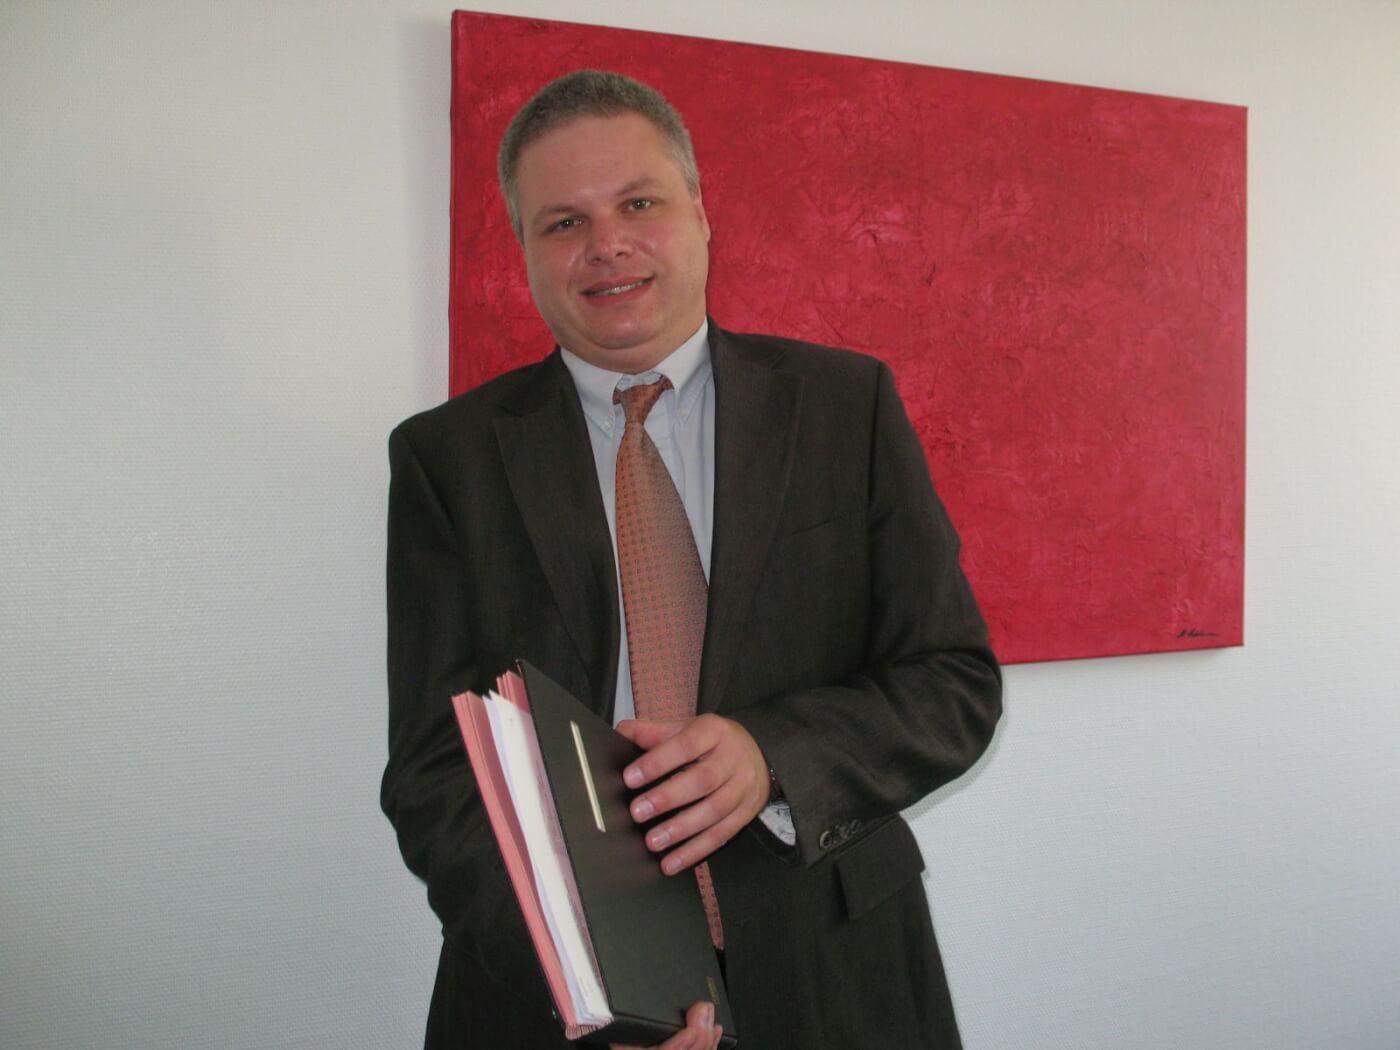 (c) Rechtsanwalt-schwartmann.de